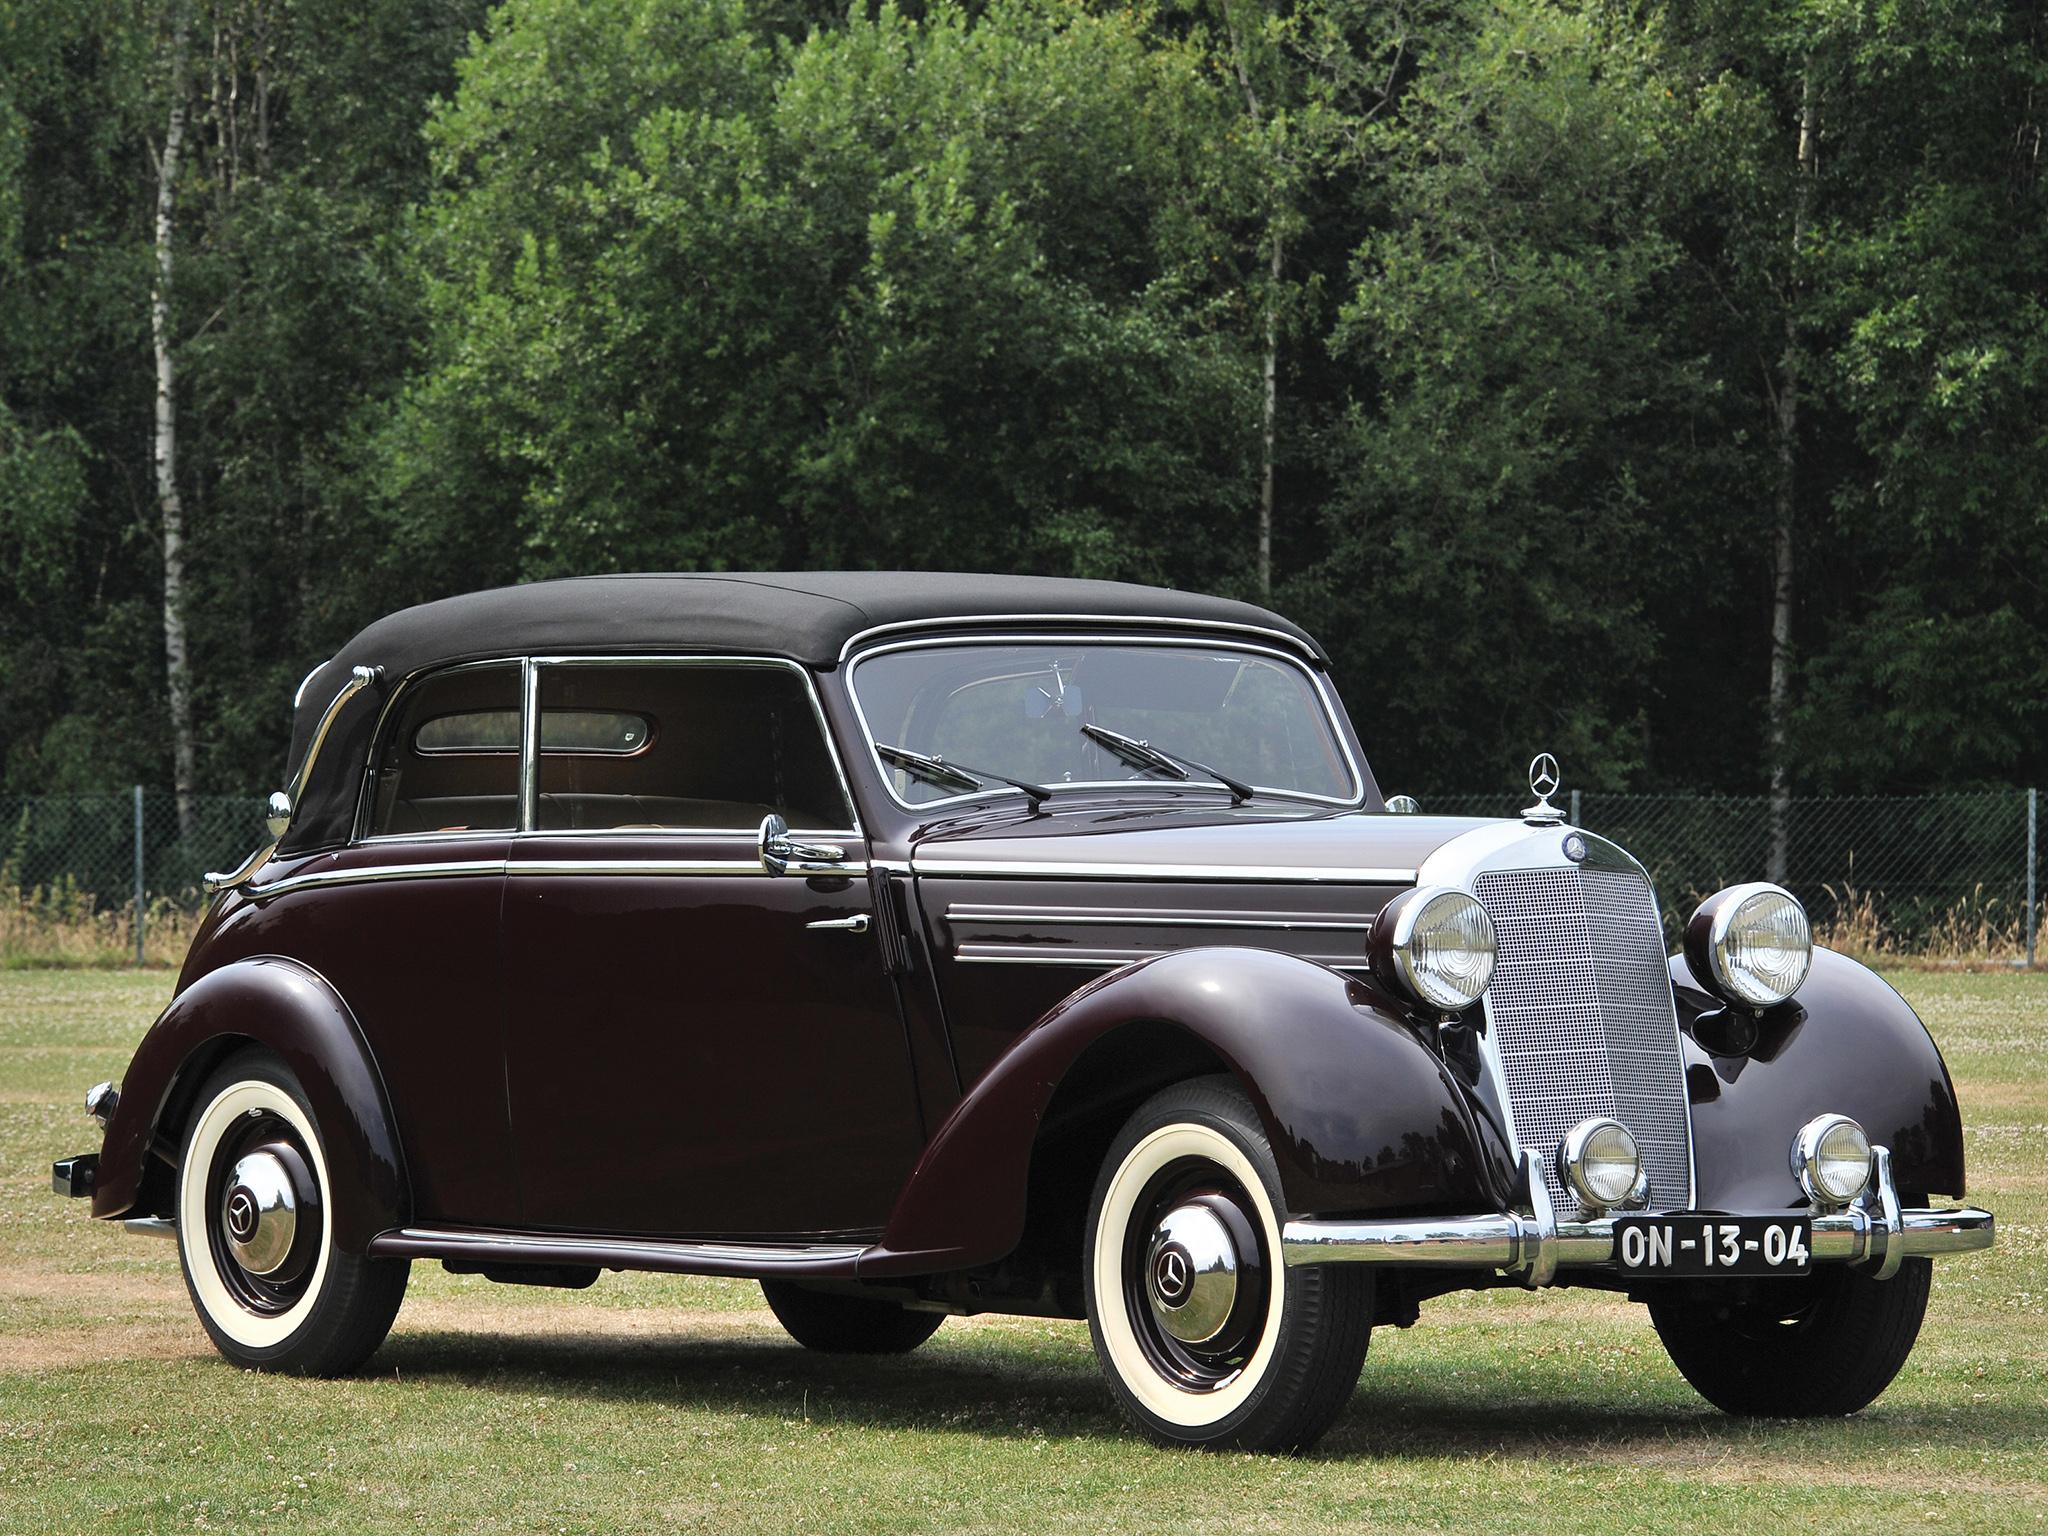 1950 mercedes benz 170 s cabriolet b luxury retro g wallpaper 2048x1536 125563 wallpaperup. Black Bedroom Furniture Sets. Home Design Ideas